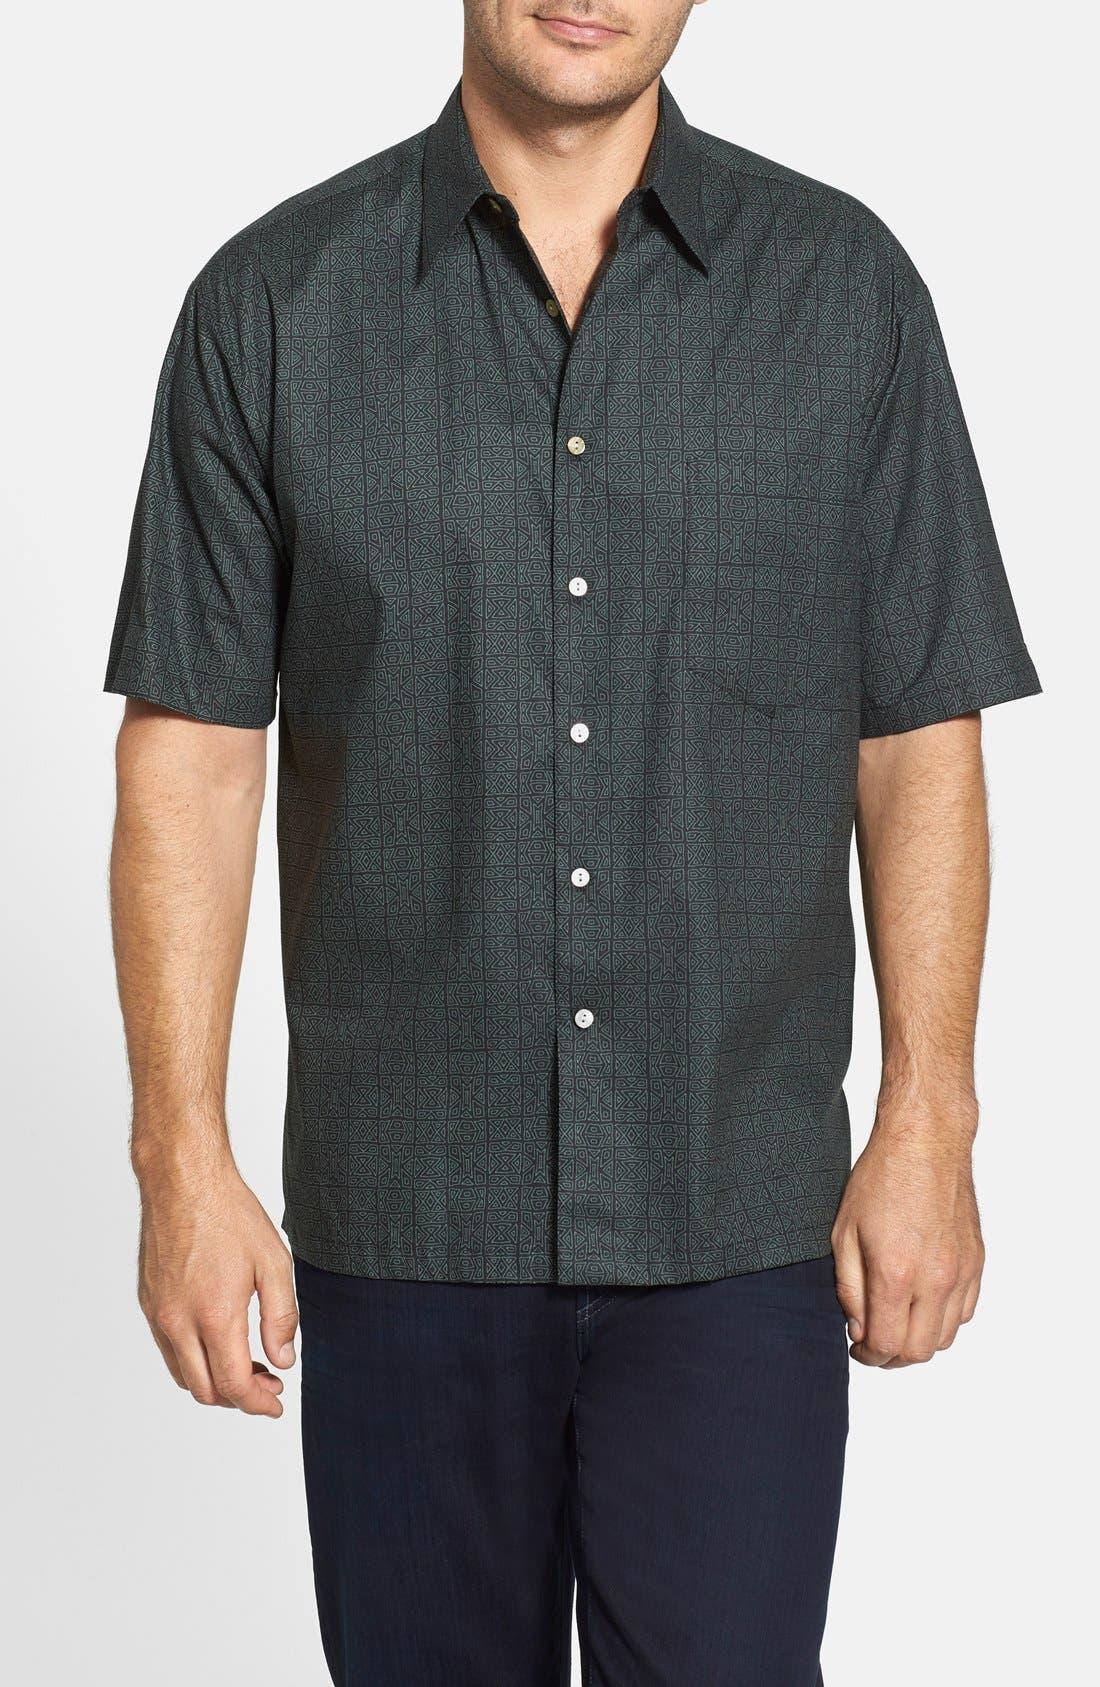 Alternate Image 1 Selected - Tori Richard 'Tribal Code' Cotton Lawn Campshirt